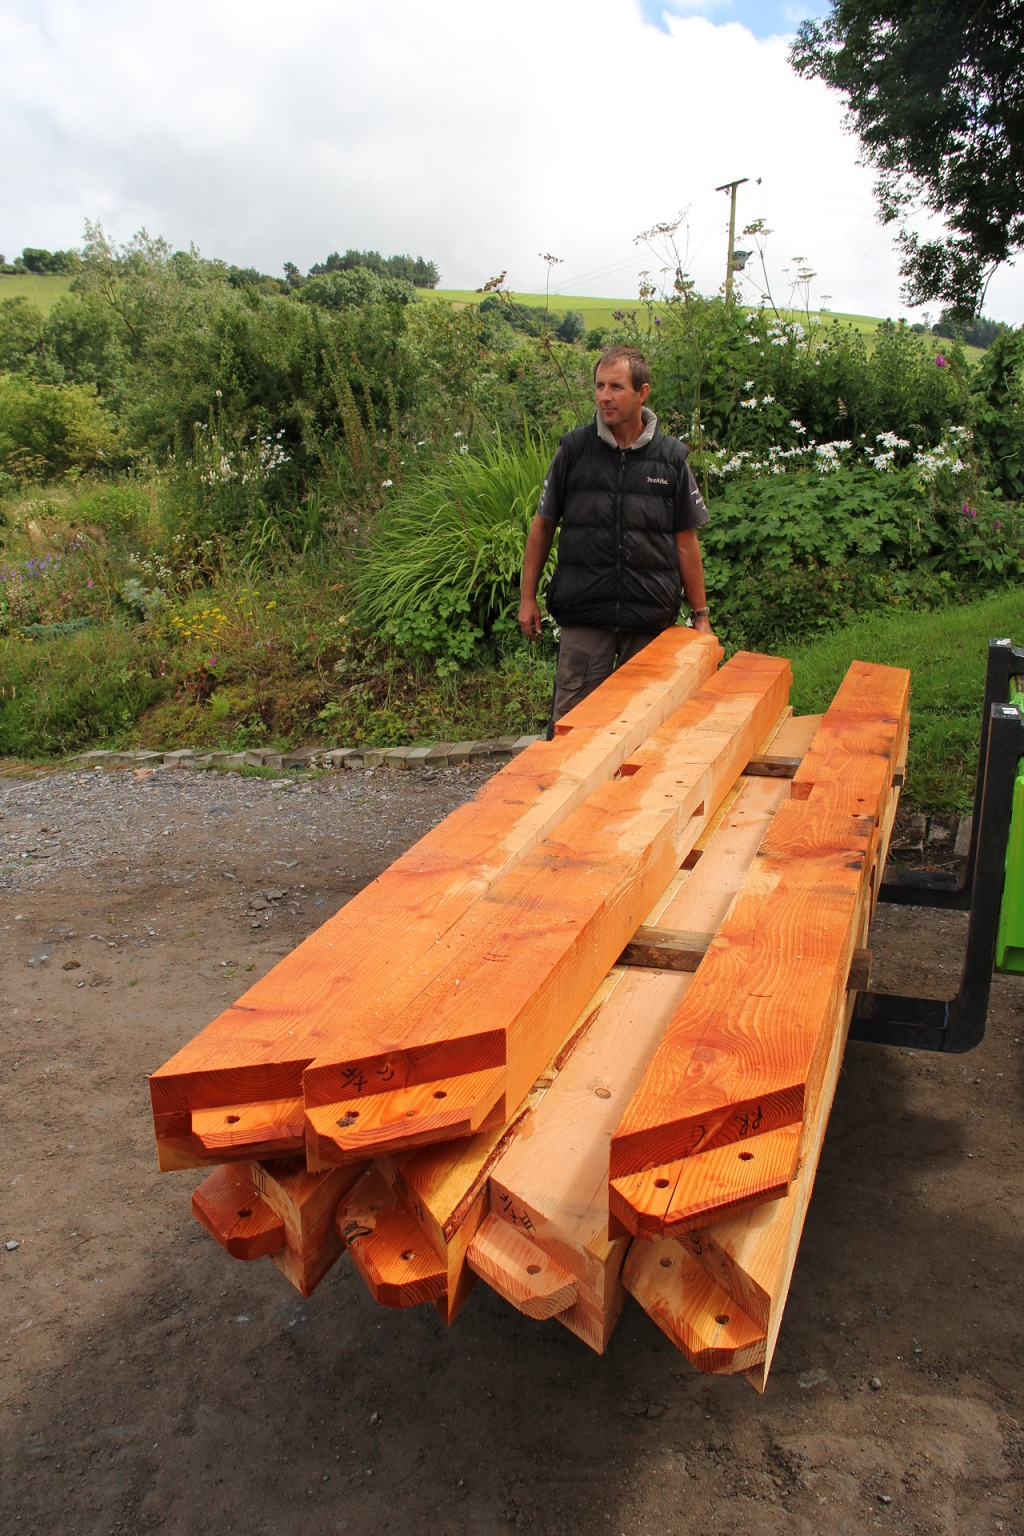 Douglas fir for timberframe house